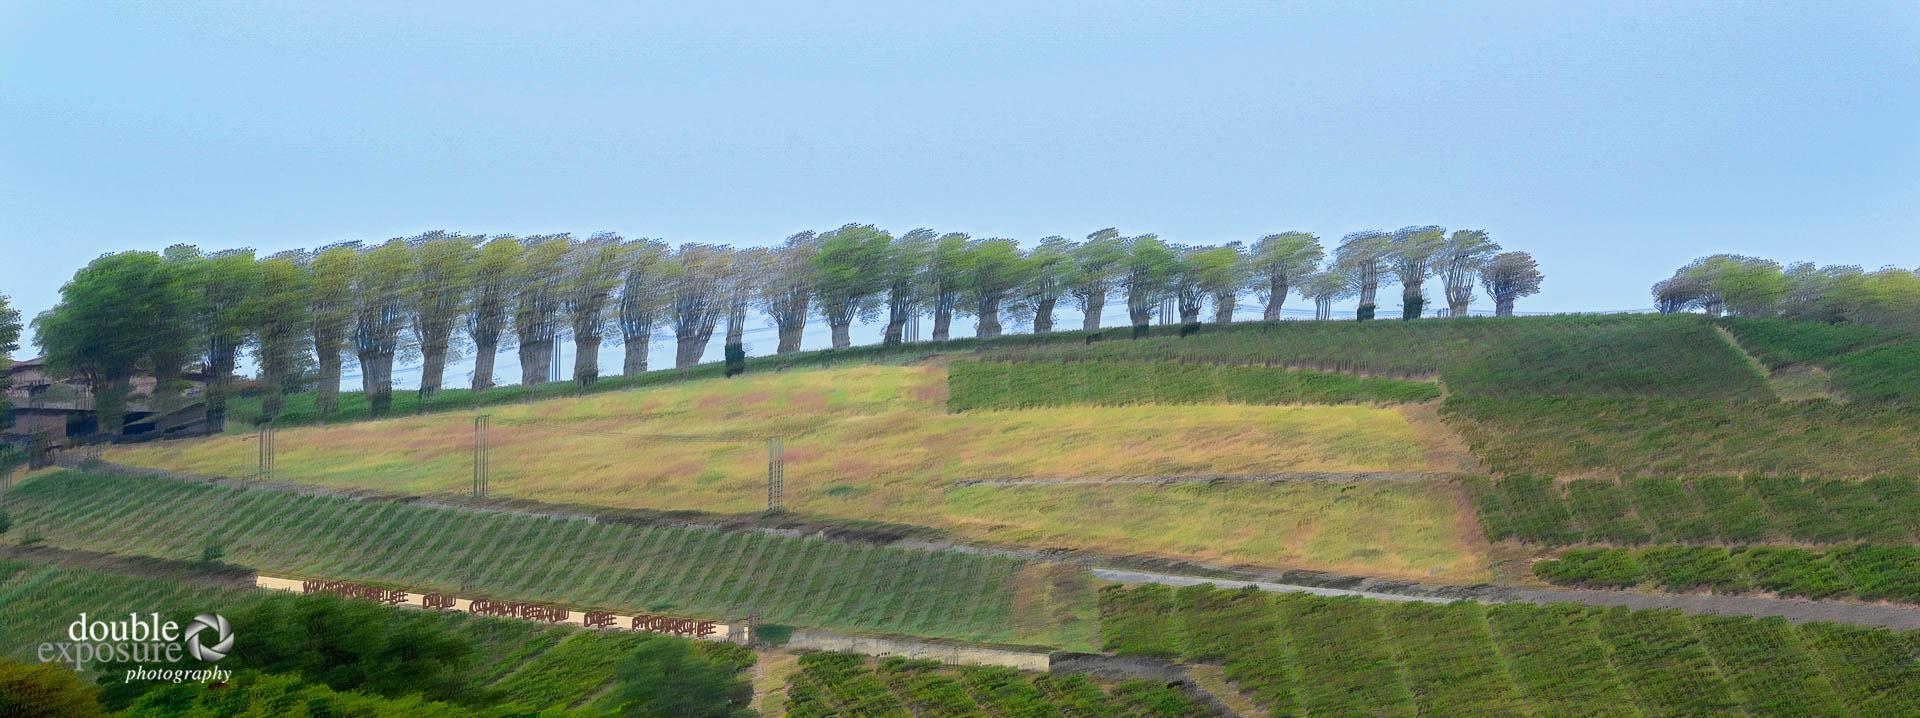 vinyards in Beaujolais